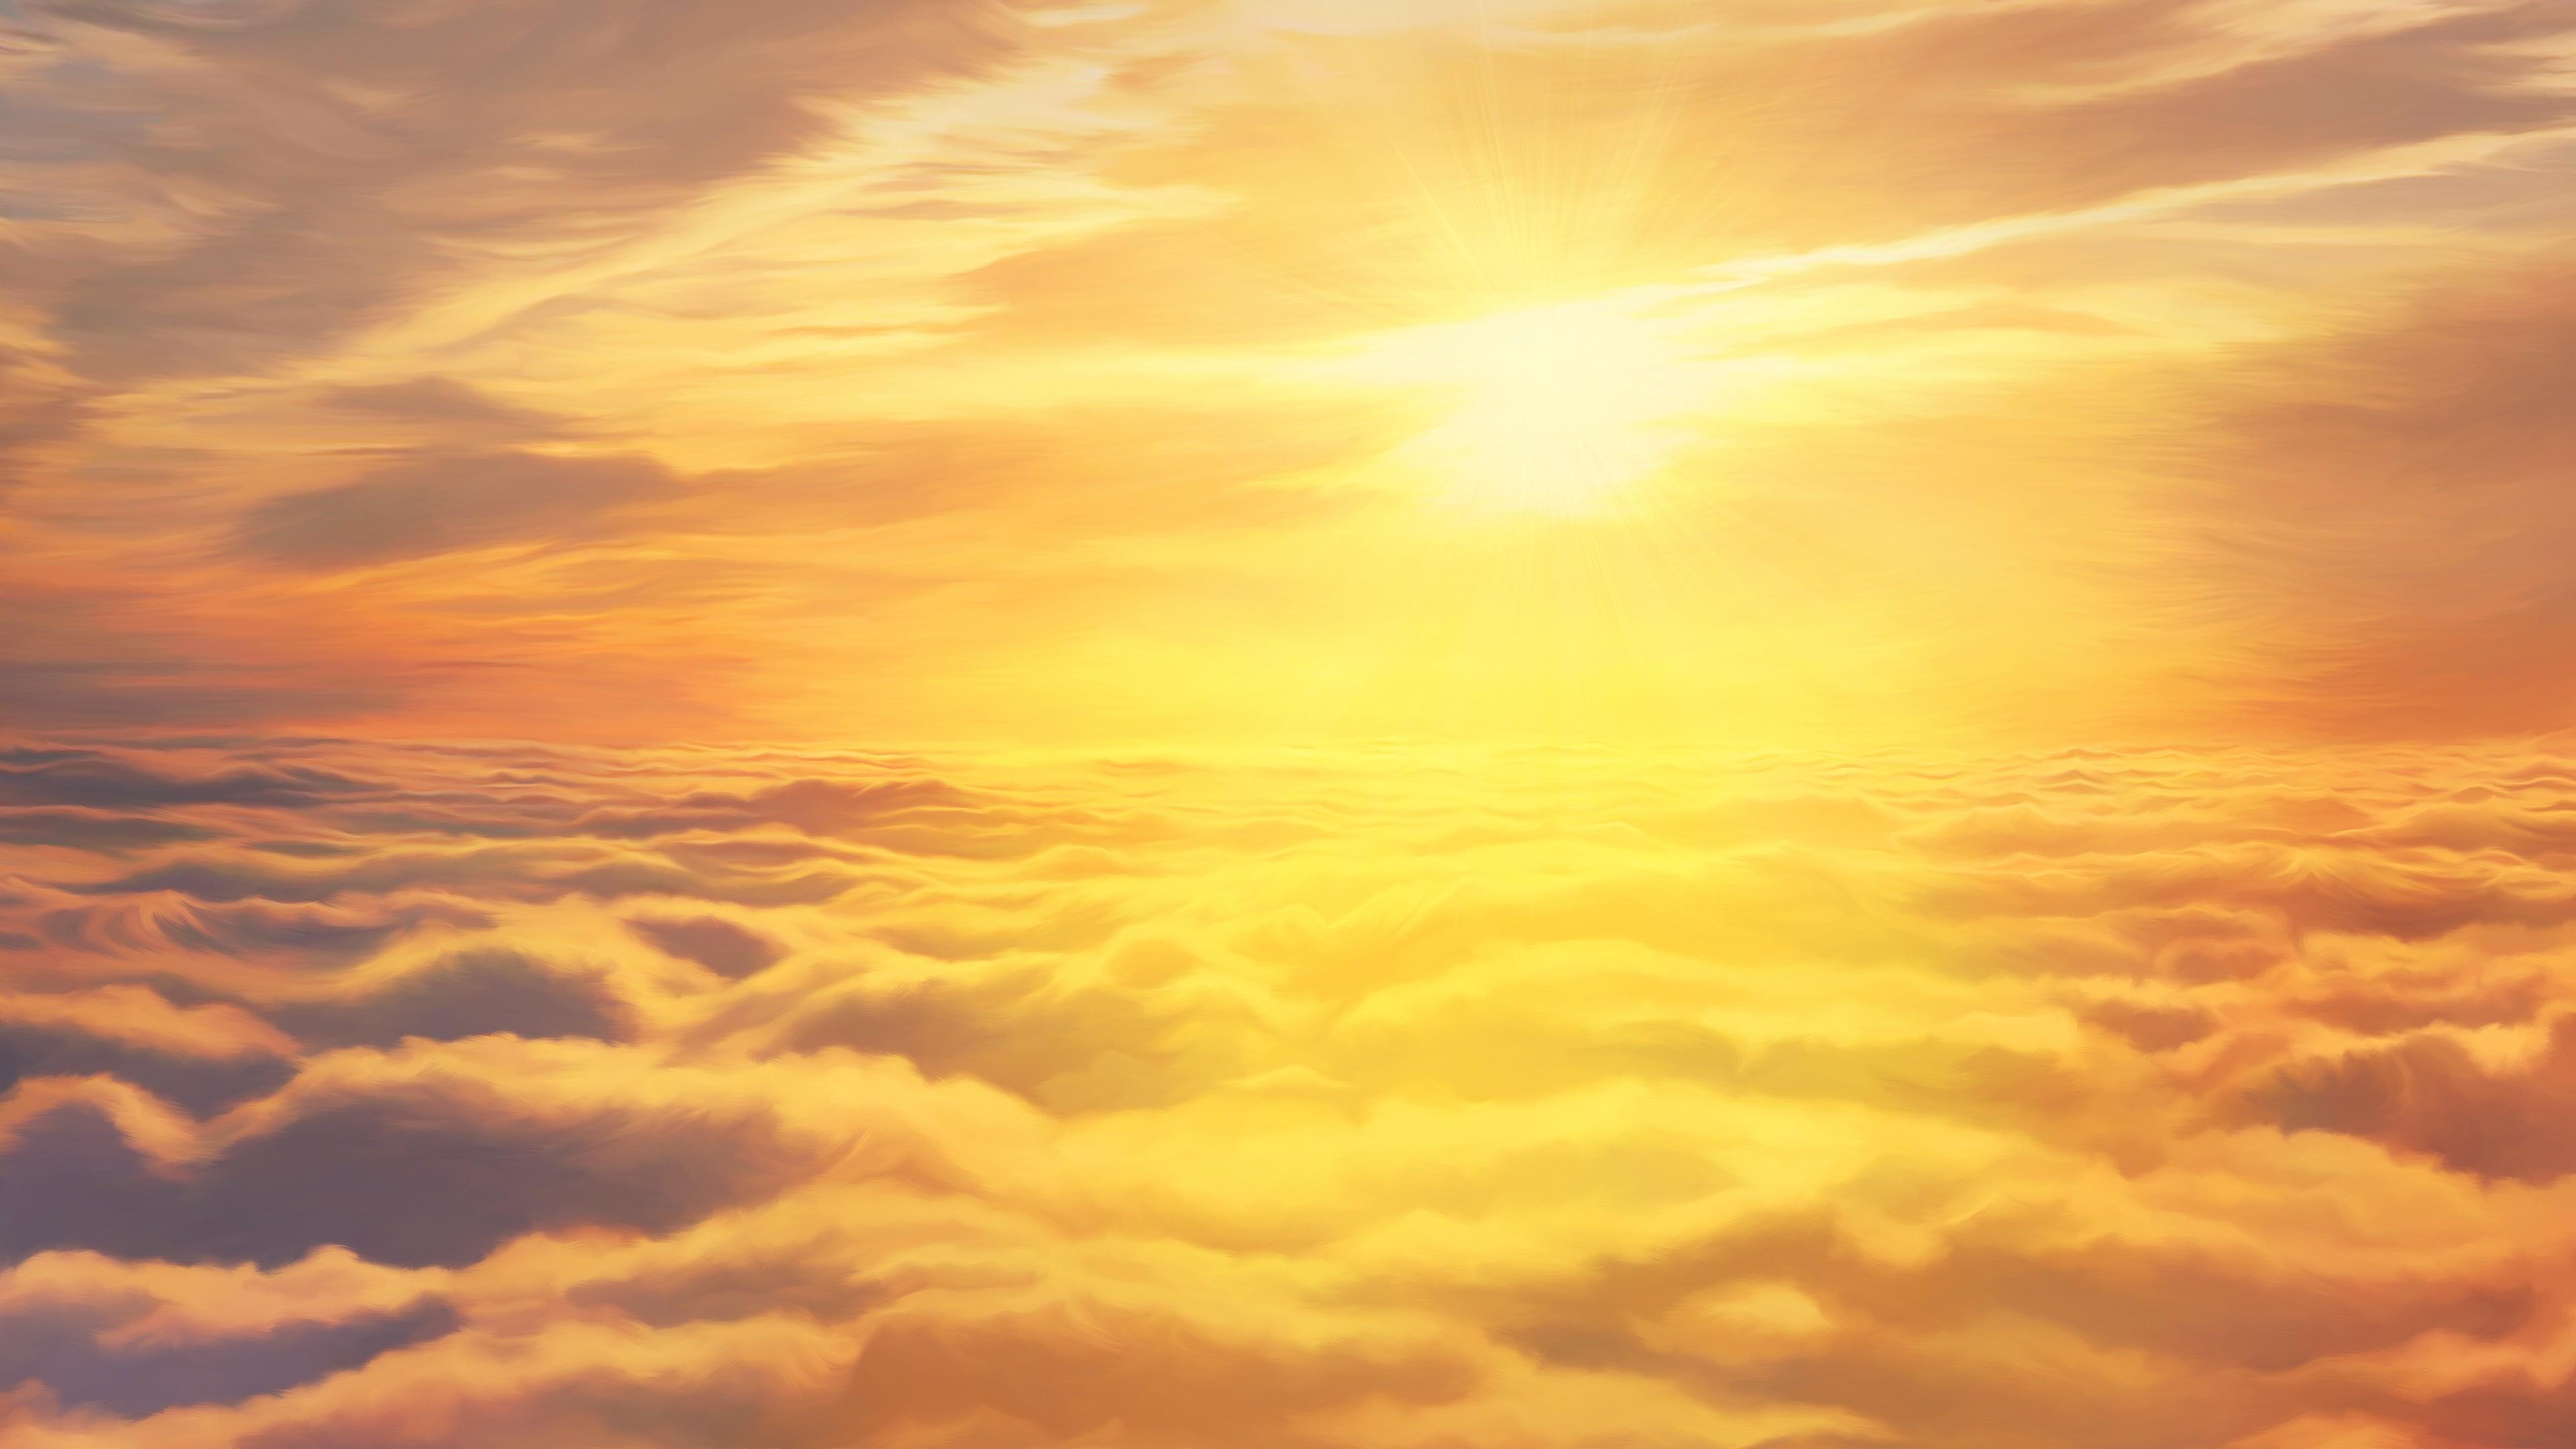 sky sun illustration artwork 4k 1540754369 - Sky Sun Illustration Artwork 4k - sun wallpapers, sky wallpapers, illustration wallpapers, hd-wallpapers, digital art wallpapers, artwork wallpapers, artist wallpapers, 4k-wallpapers